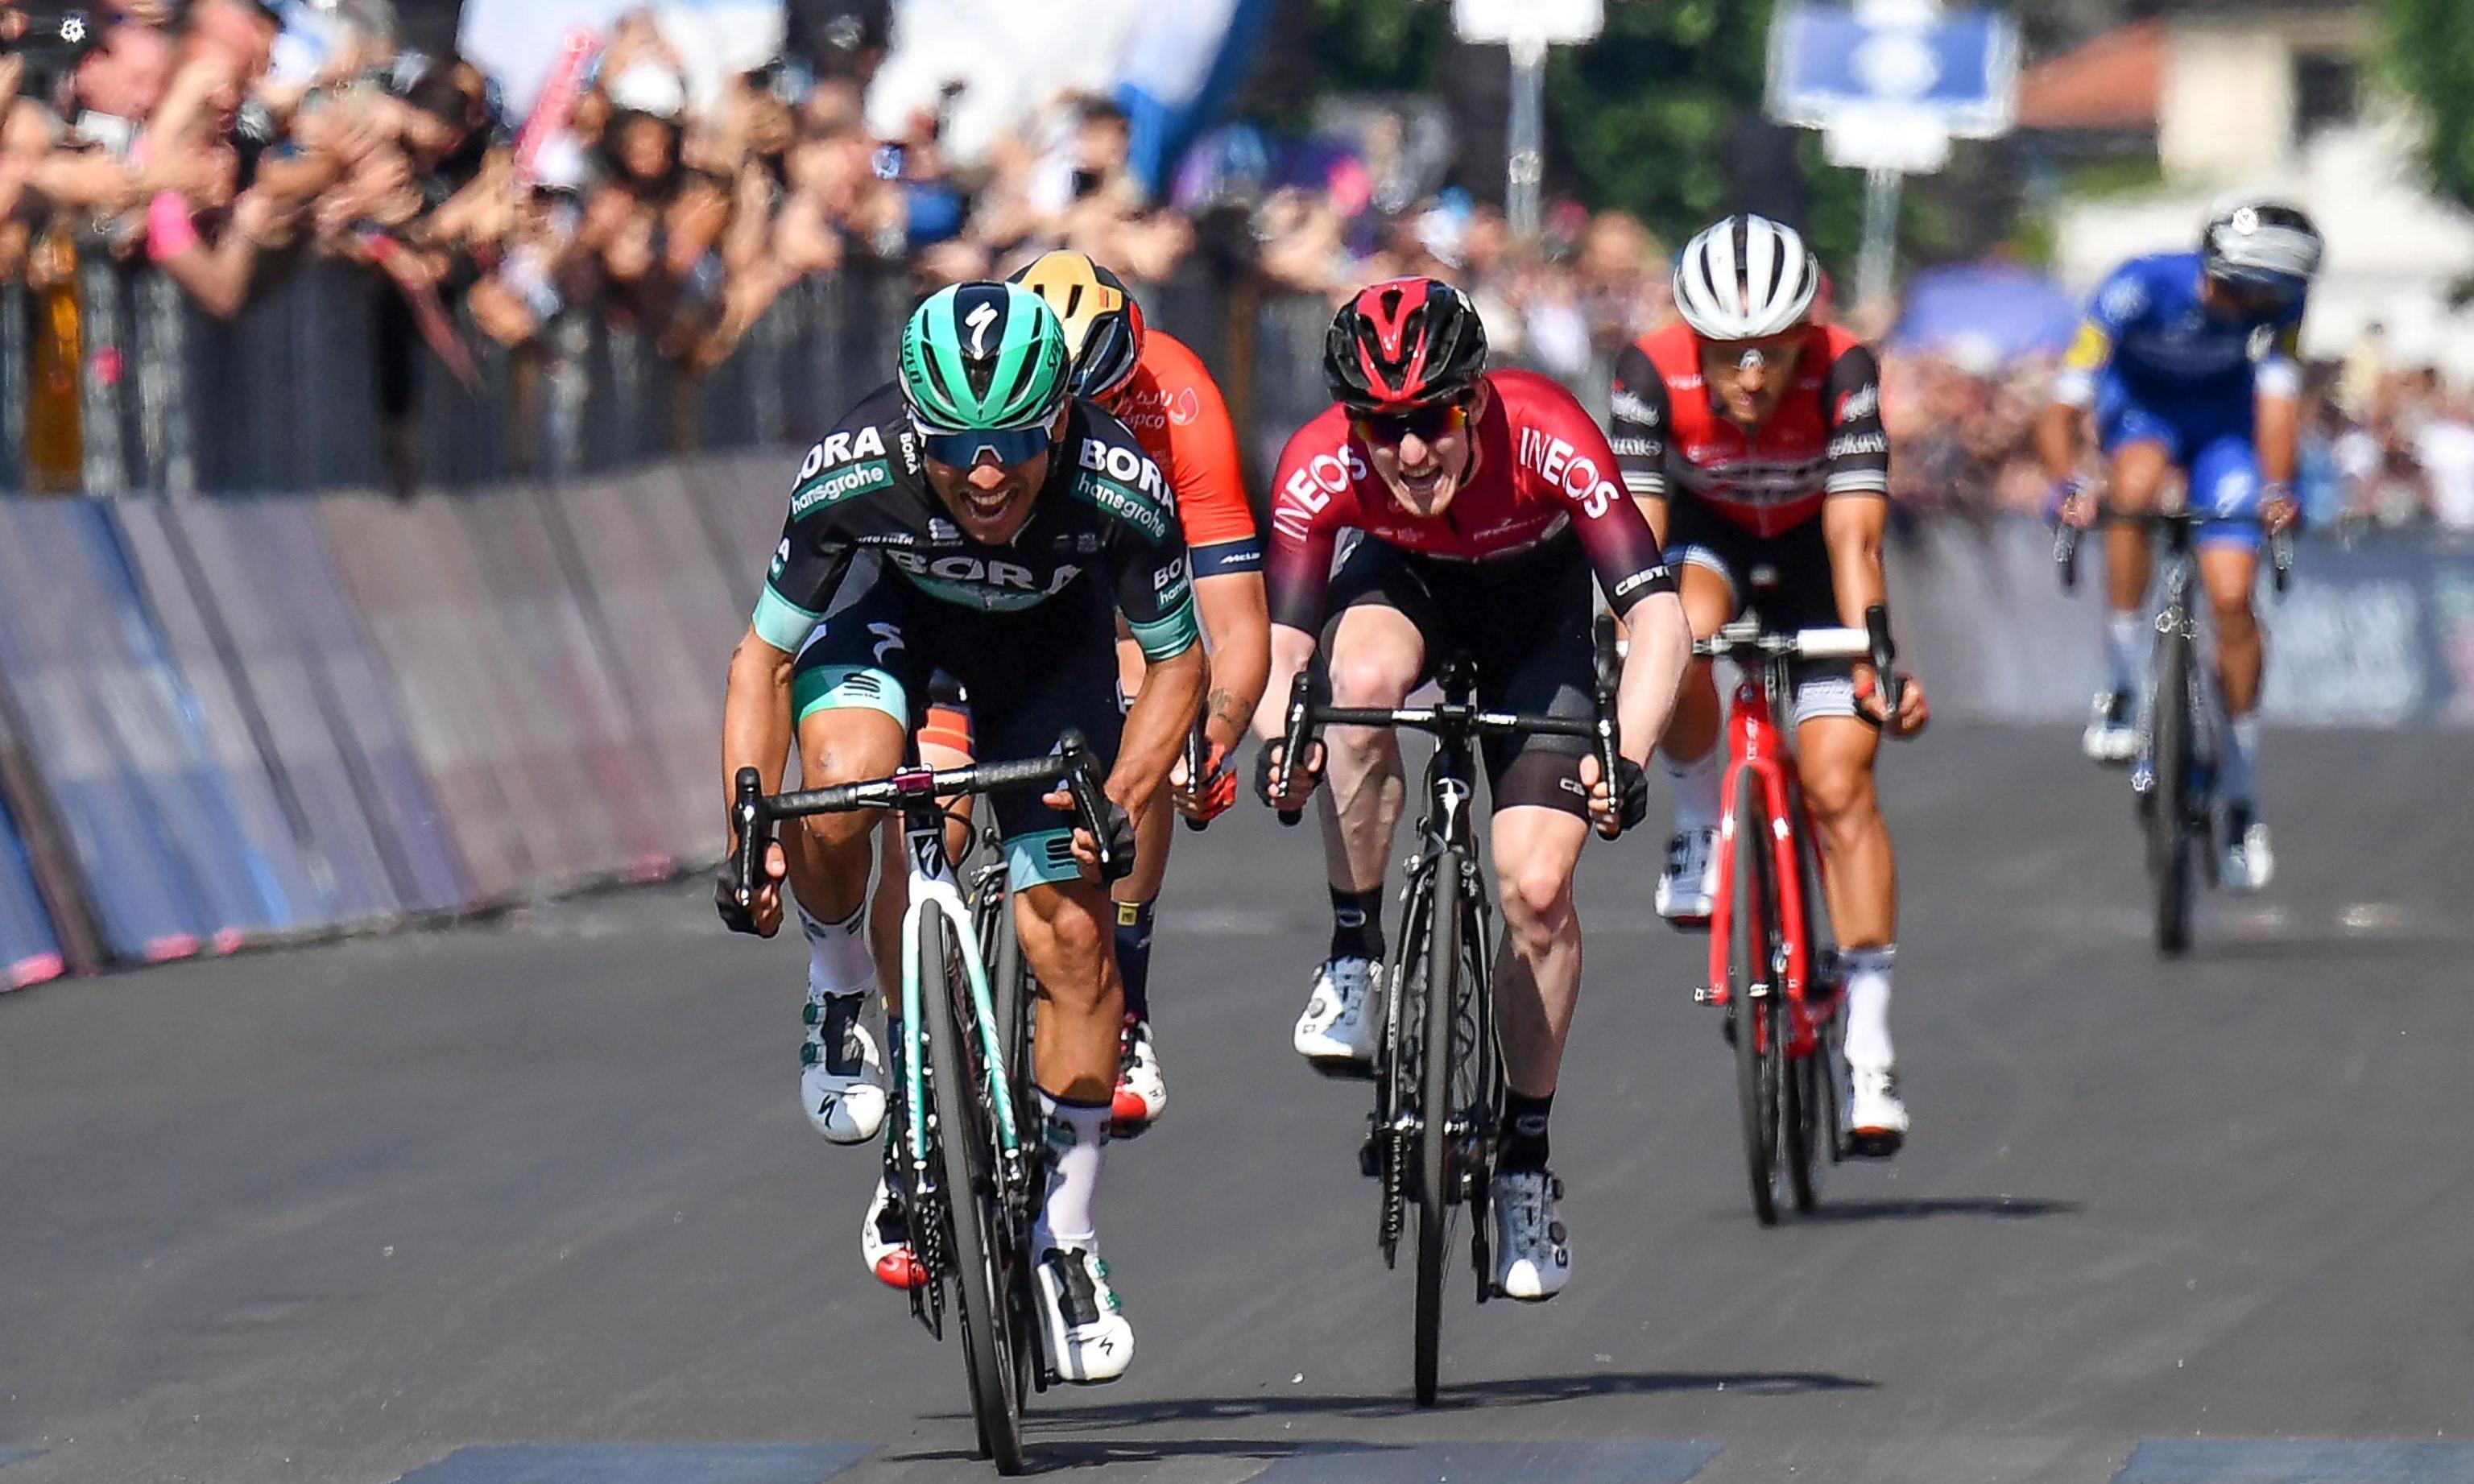 Benedetti pips Dunbar to Giro d'Italia stage 12 win as Polanc takes pink jersey